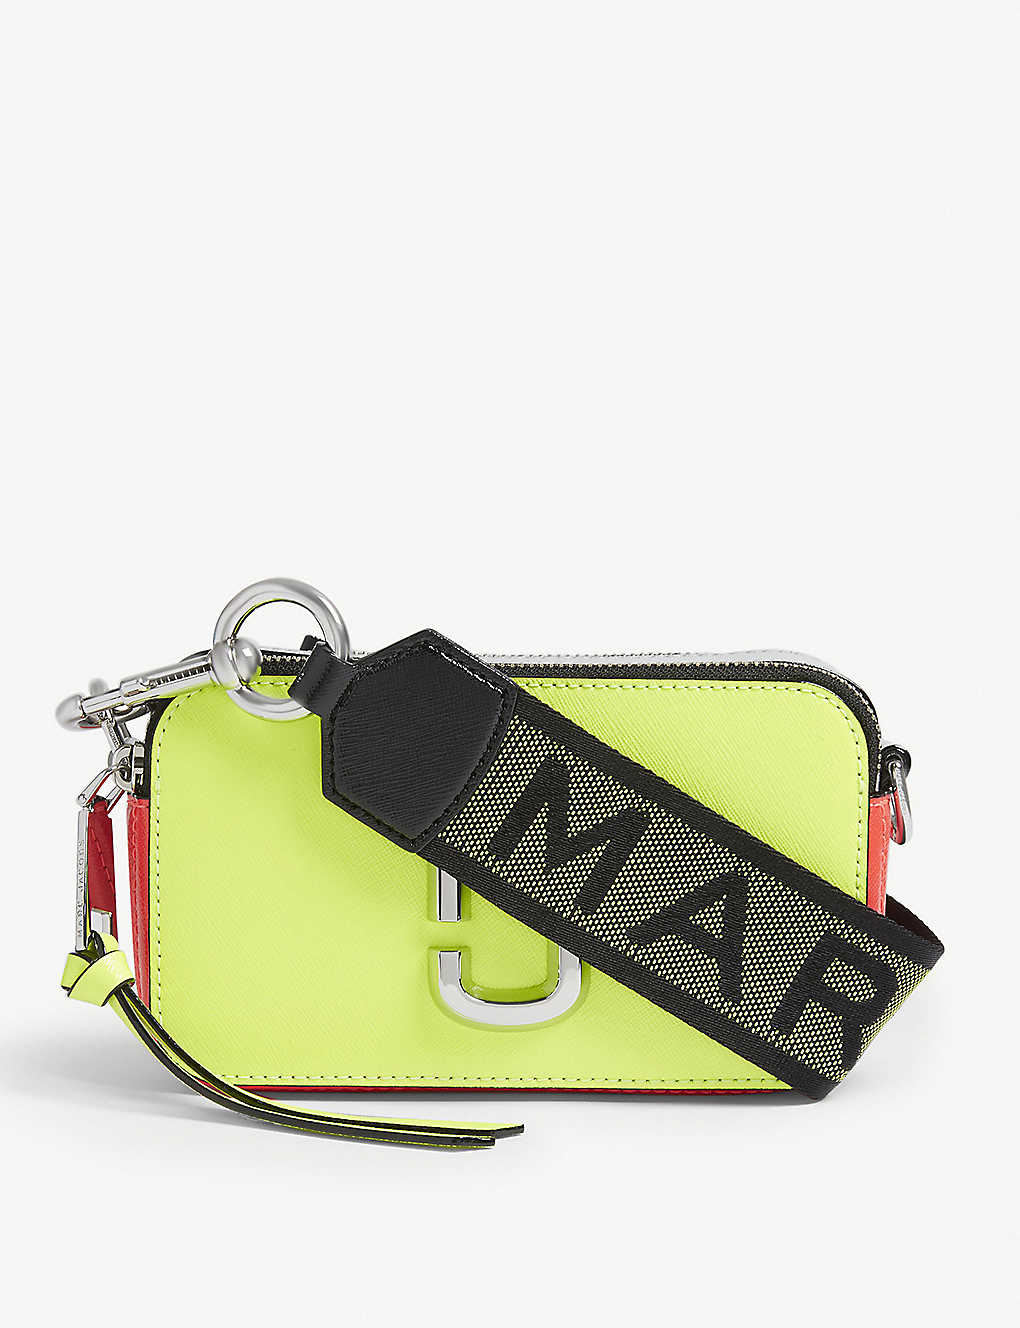 9dc8f09c2ed MARC JACOBS - Snapshot cross-body bag | Selfridges.com